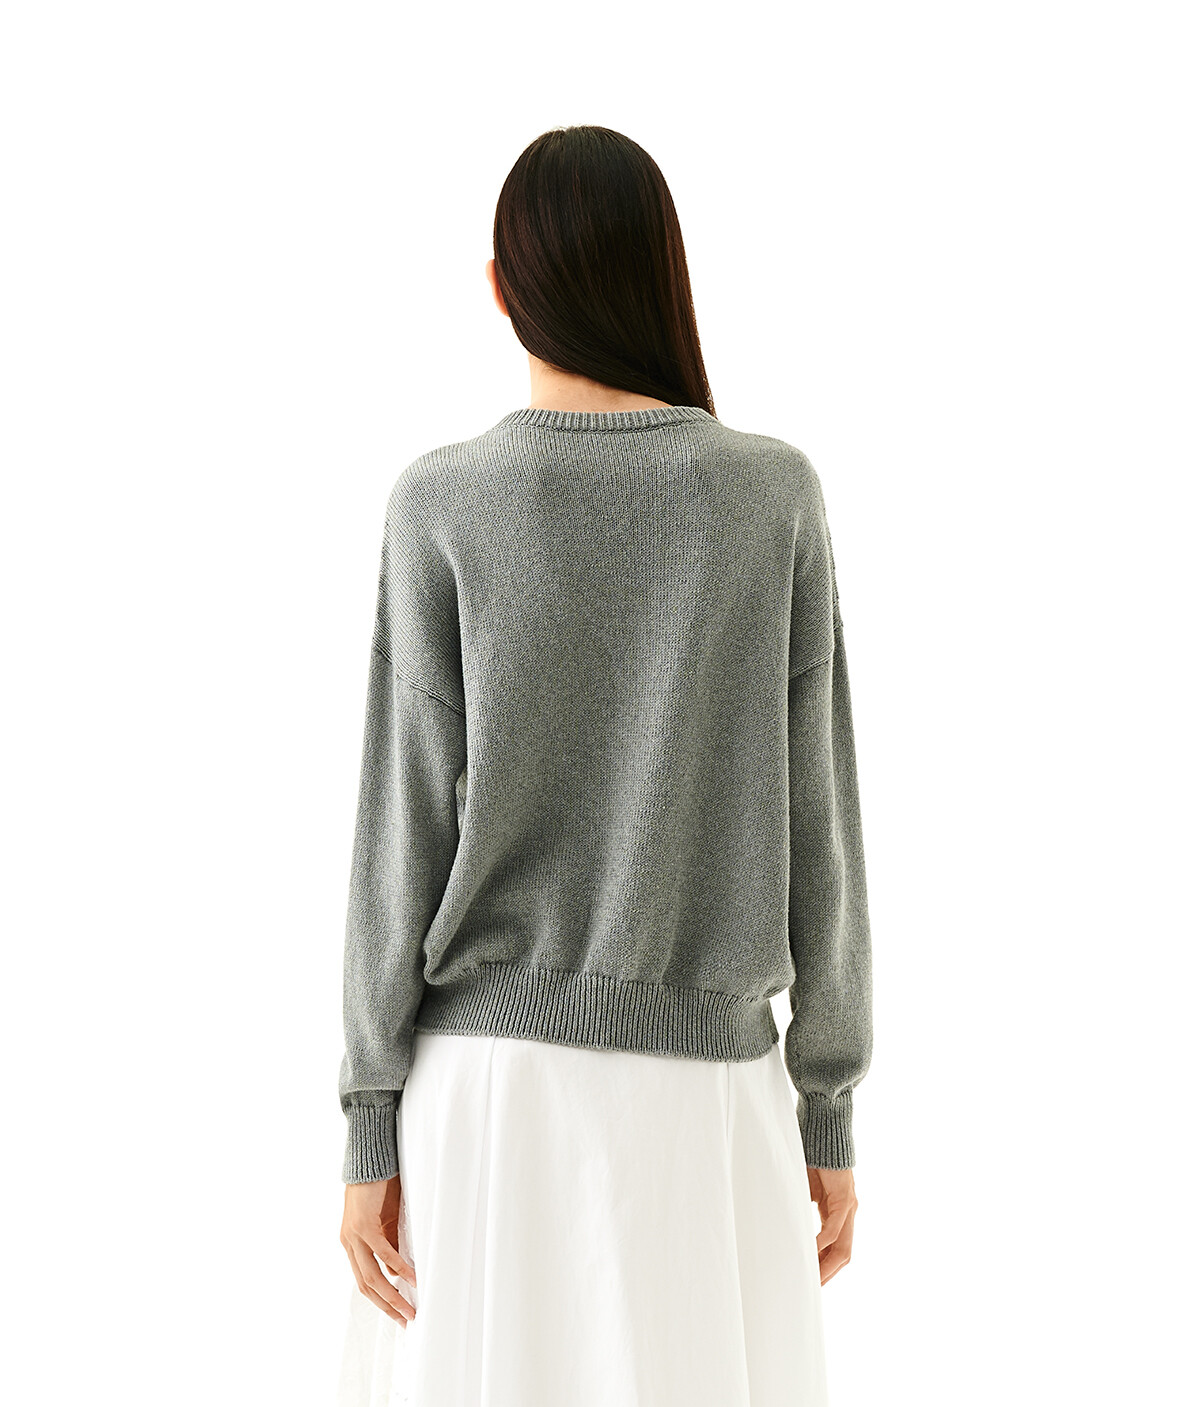 LOEWE Loewe Stitch Sweater Grey front